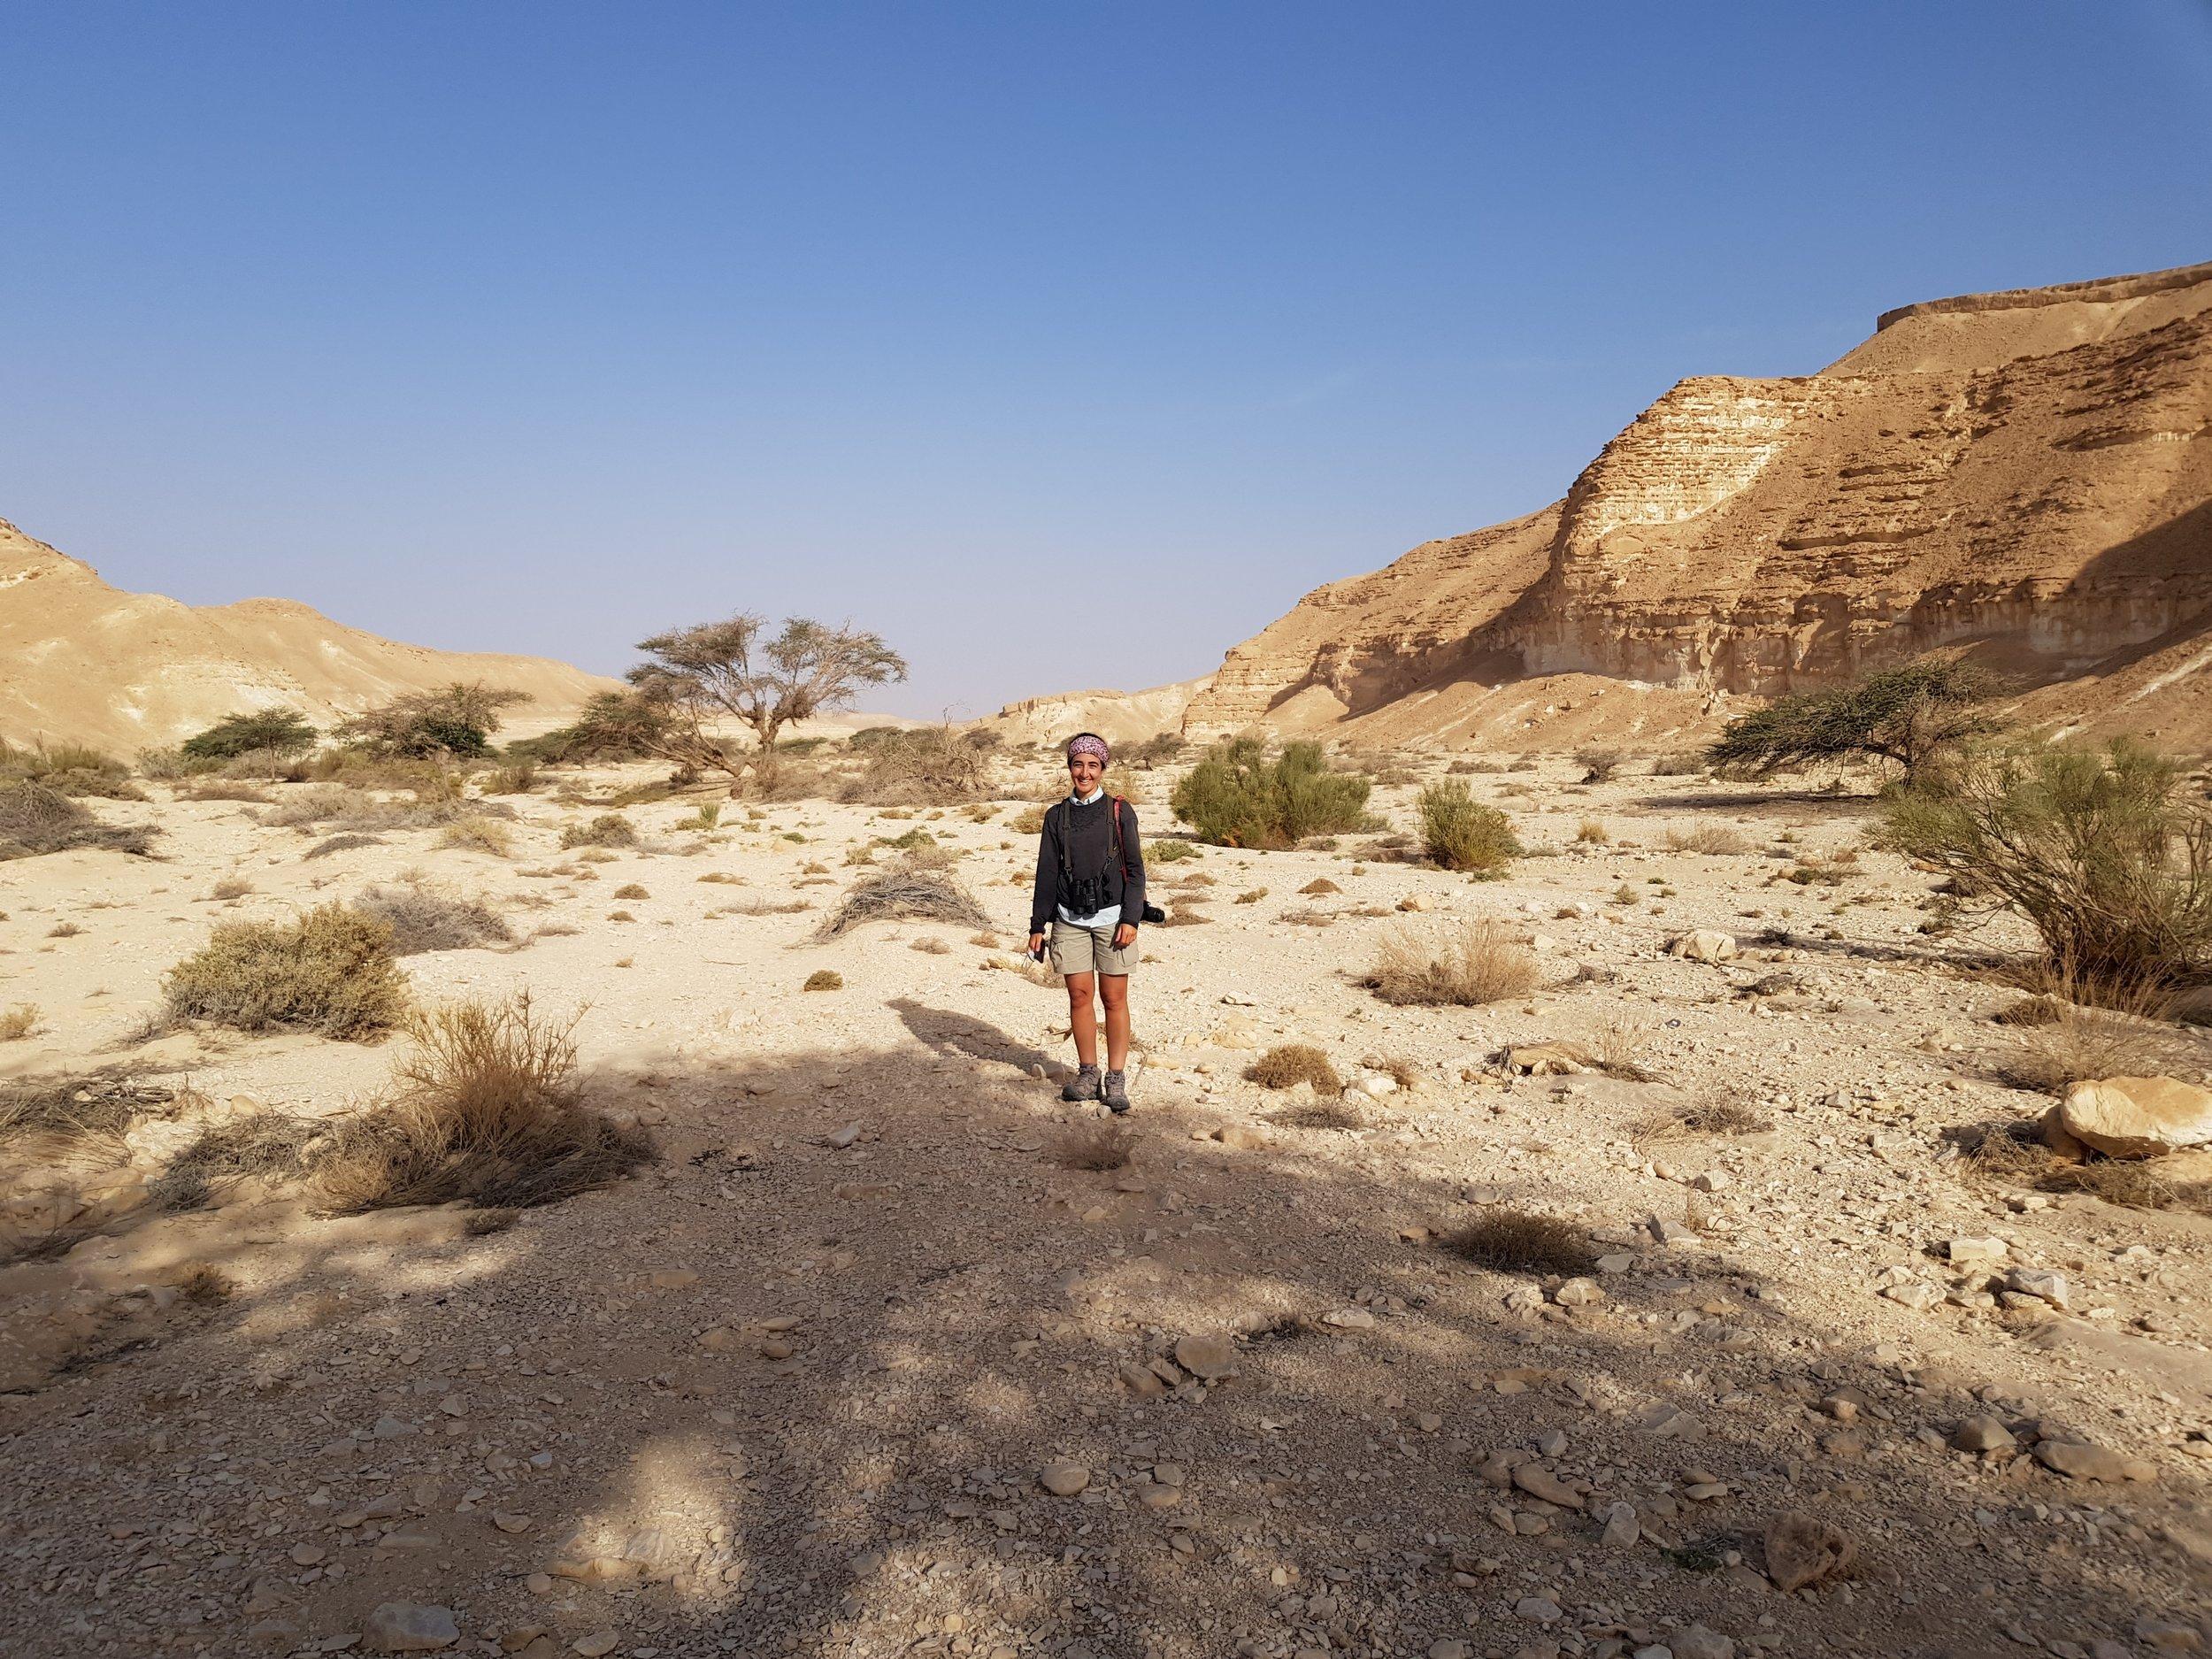 Ana in the Arava Valley near Hatzeva during the Arabian warbler survey.